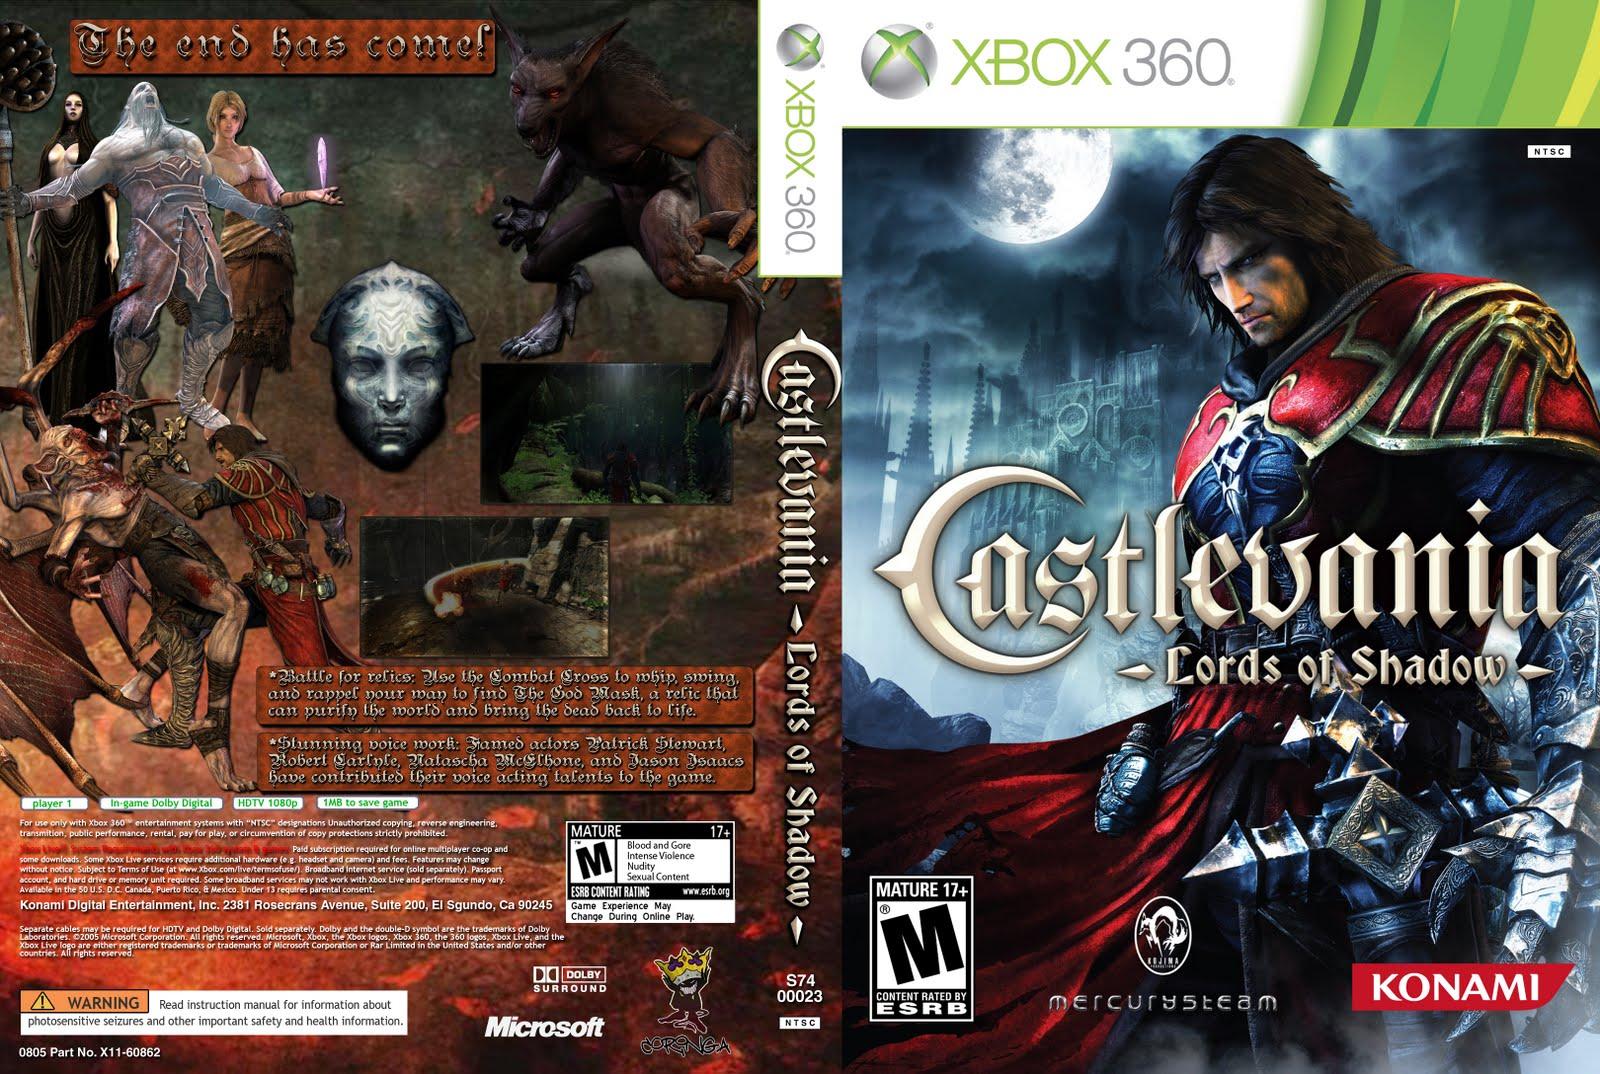 Castlevania+Lords+of+Shadows+Cover.jpg